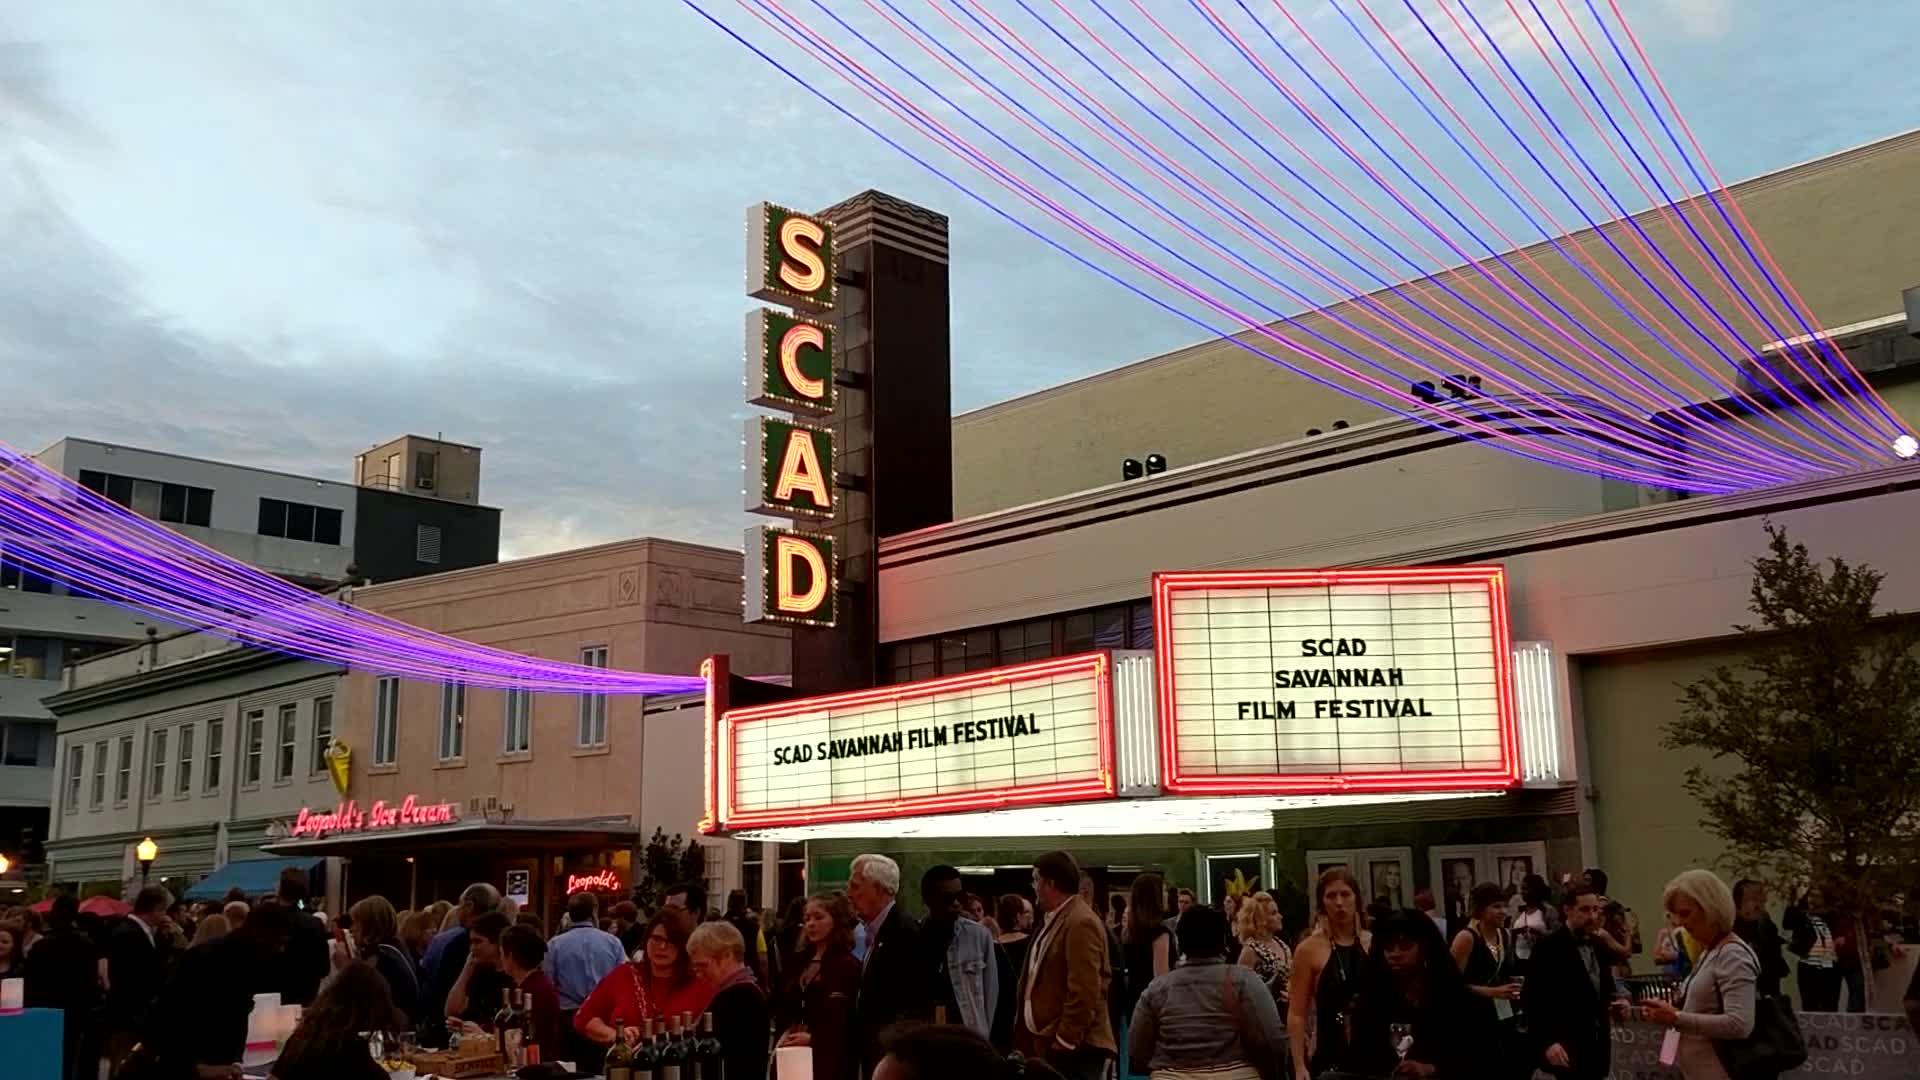 SCAD Savannah Film Festival 2017